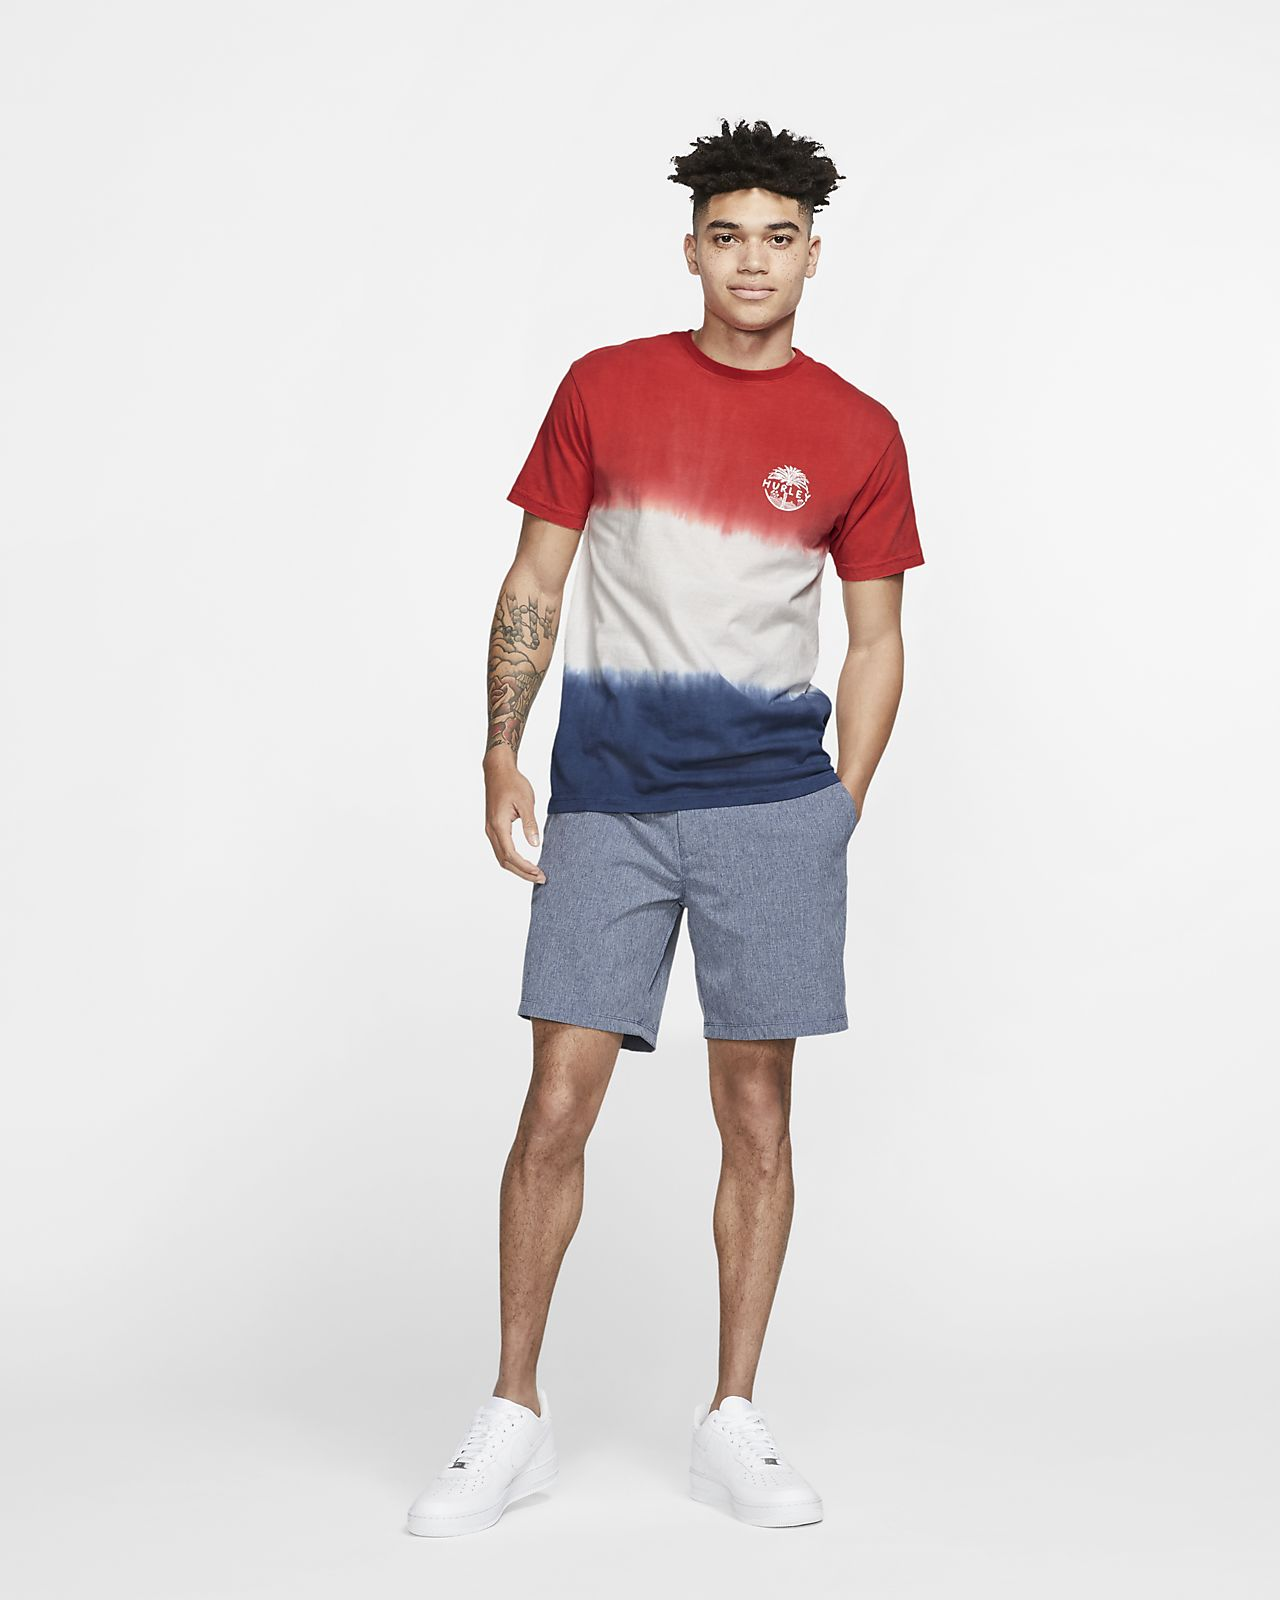 c902c7073514 Hurley USA Palmer Men s Tie Dye T-Shirt. Nike.com